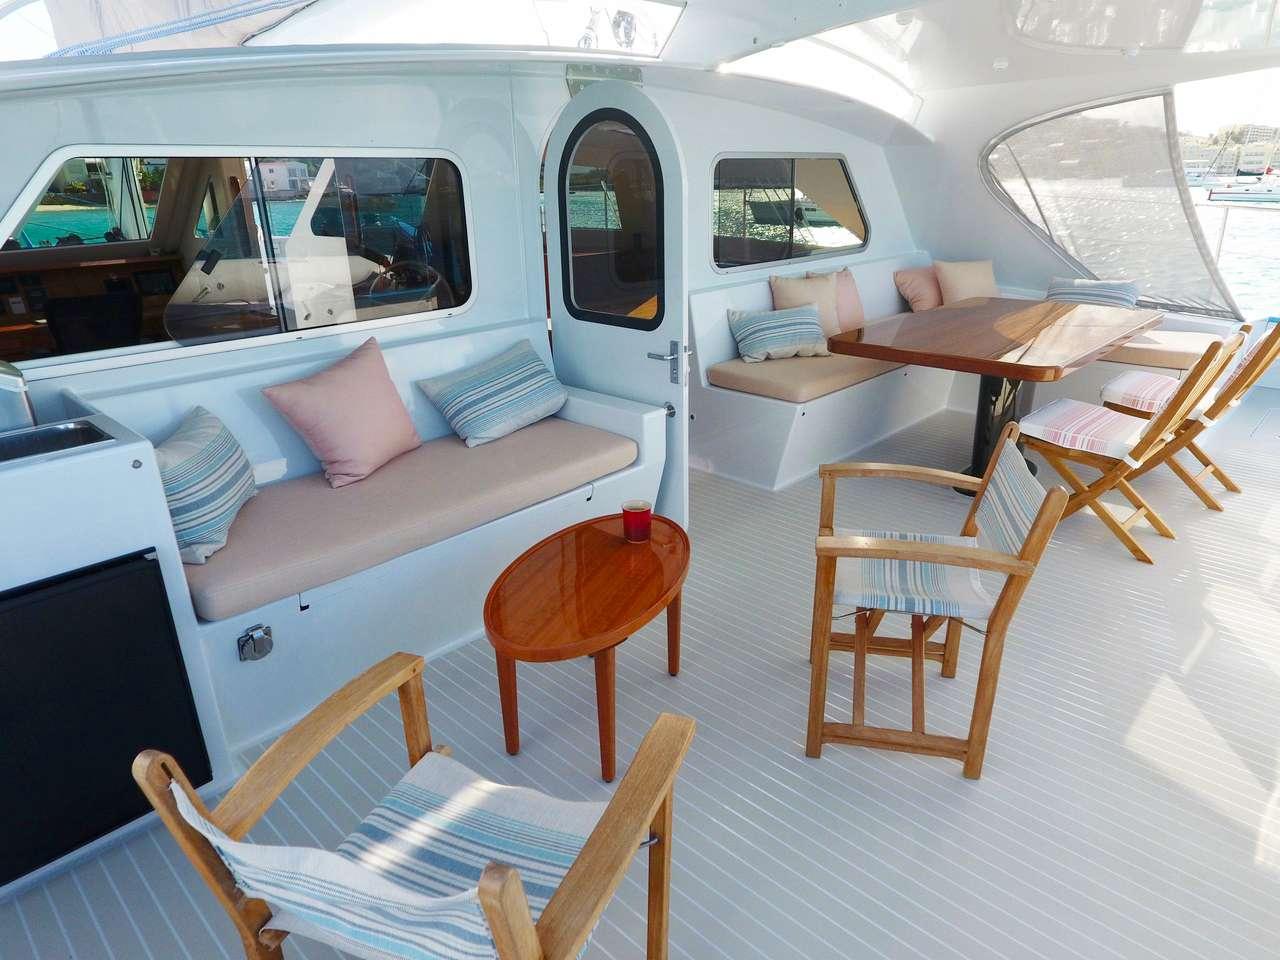 Aft lounging deck